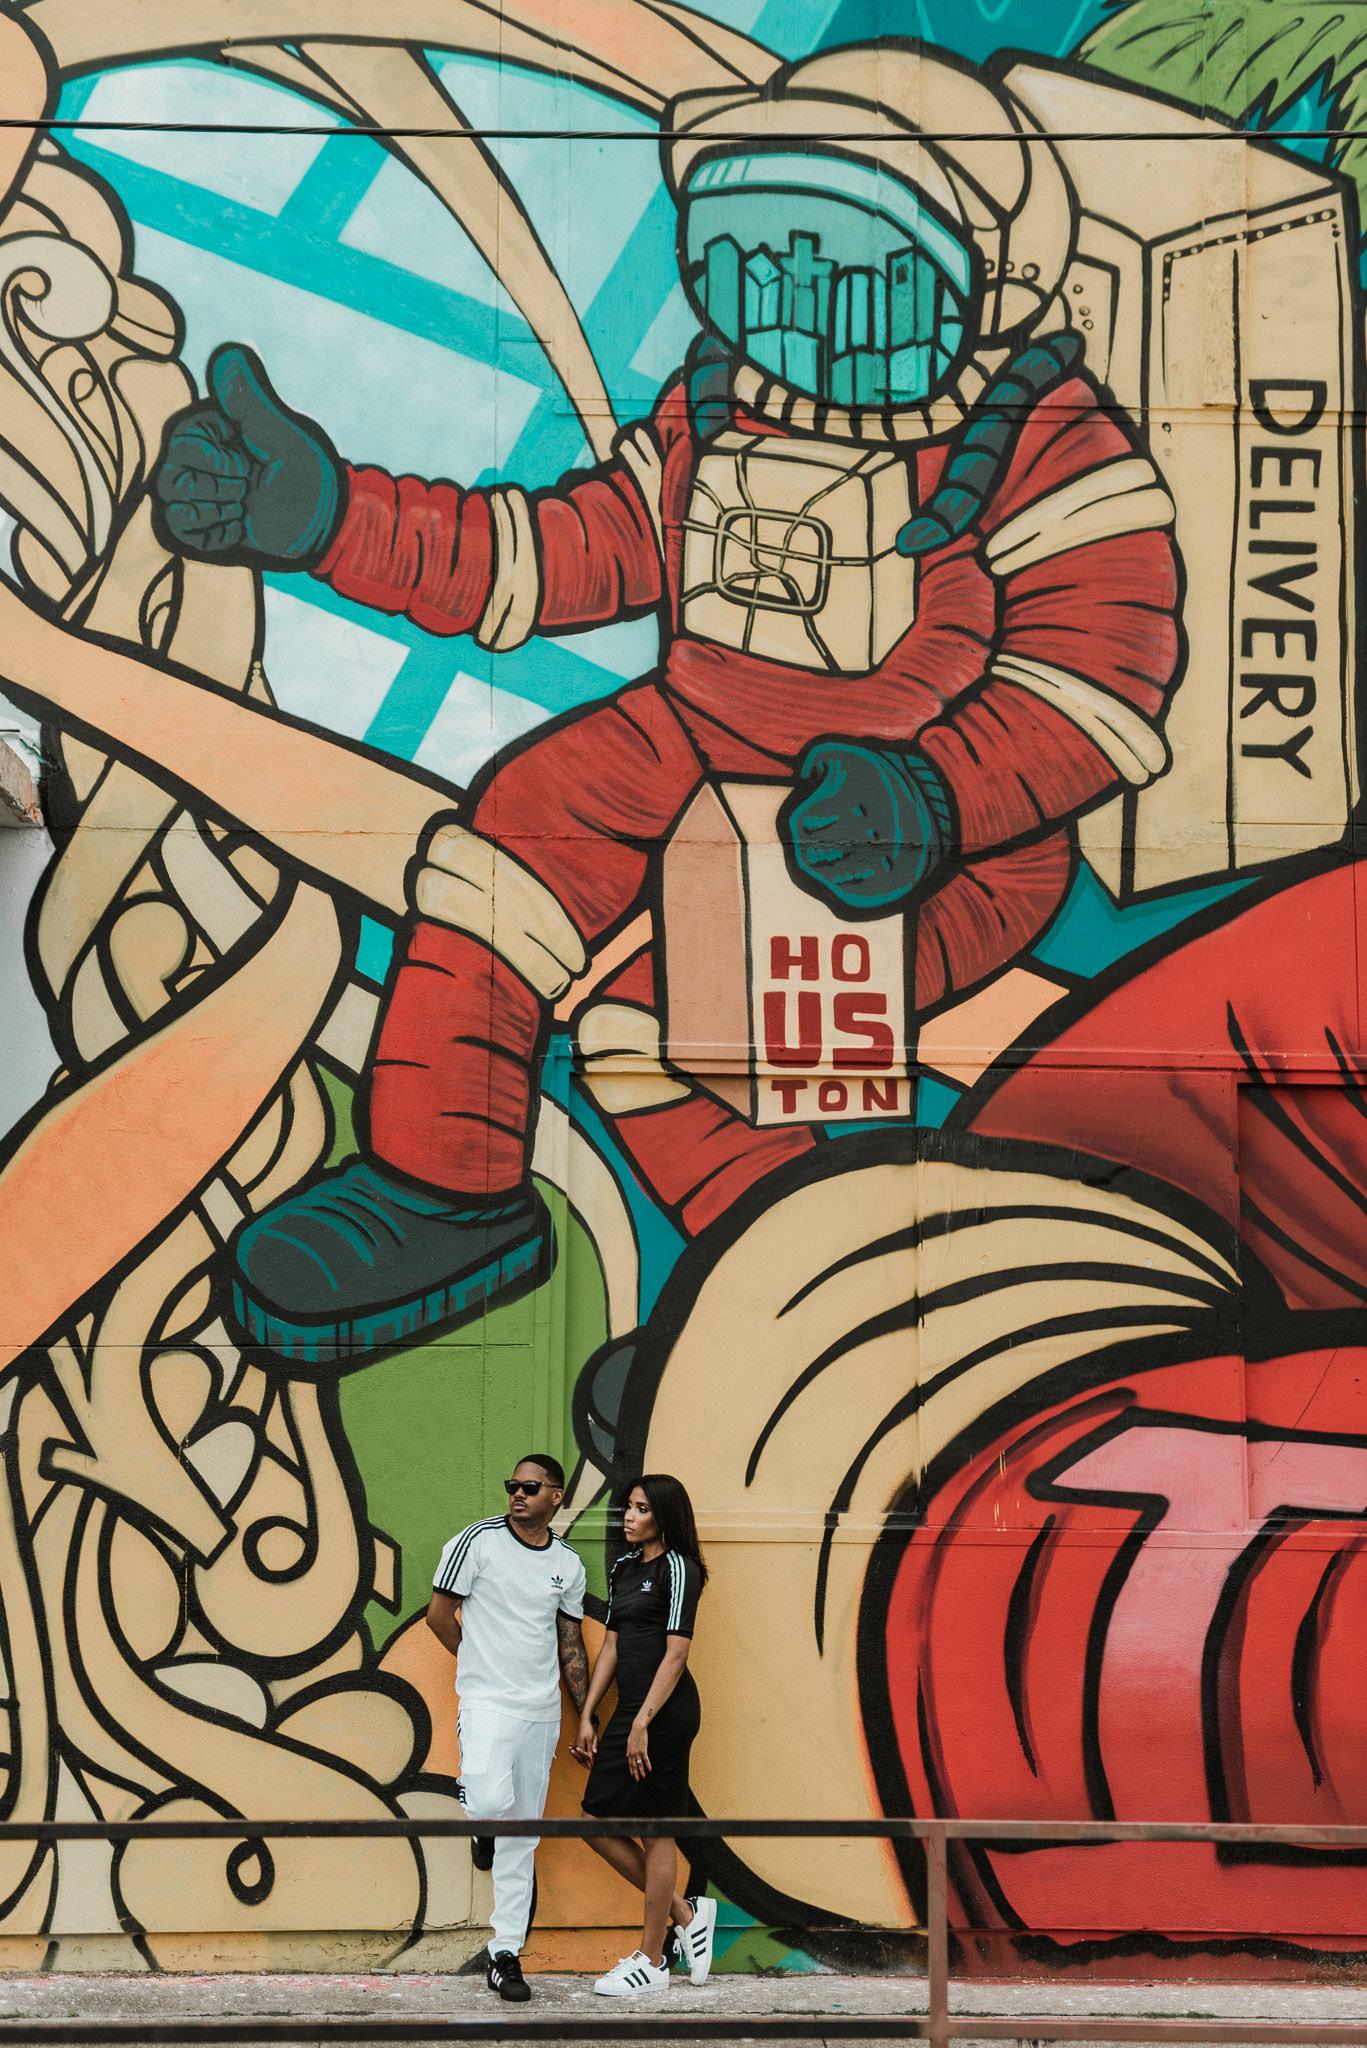 houston-graffiti-wall-astronaut-space-colorful-art-urban-black-couple-engagement-photography